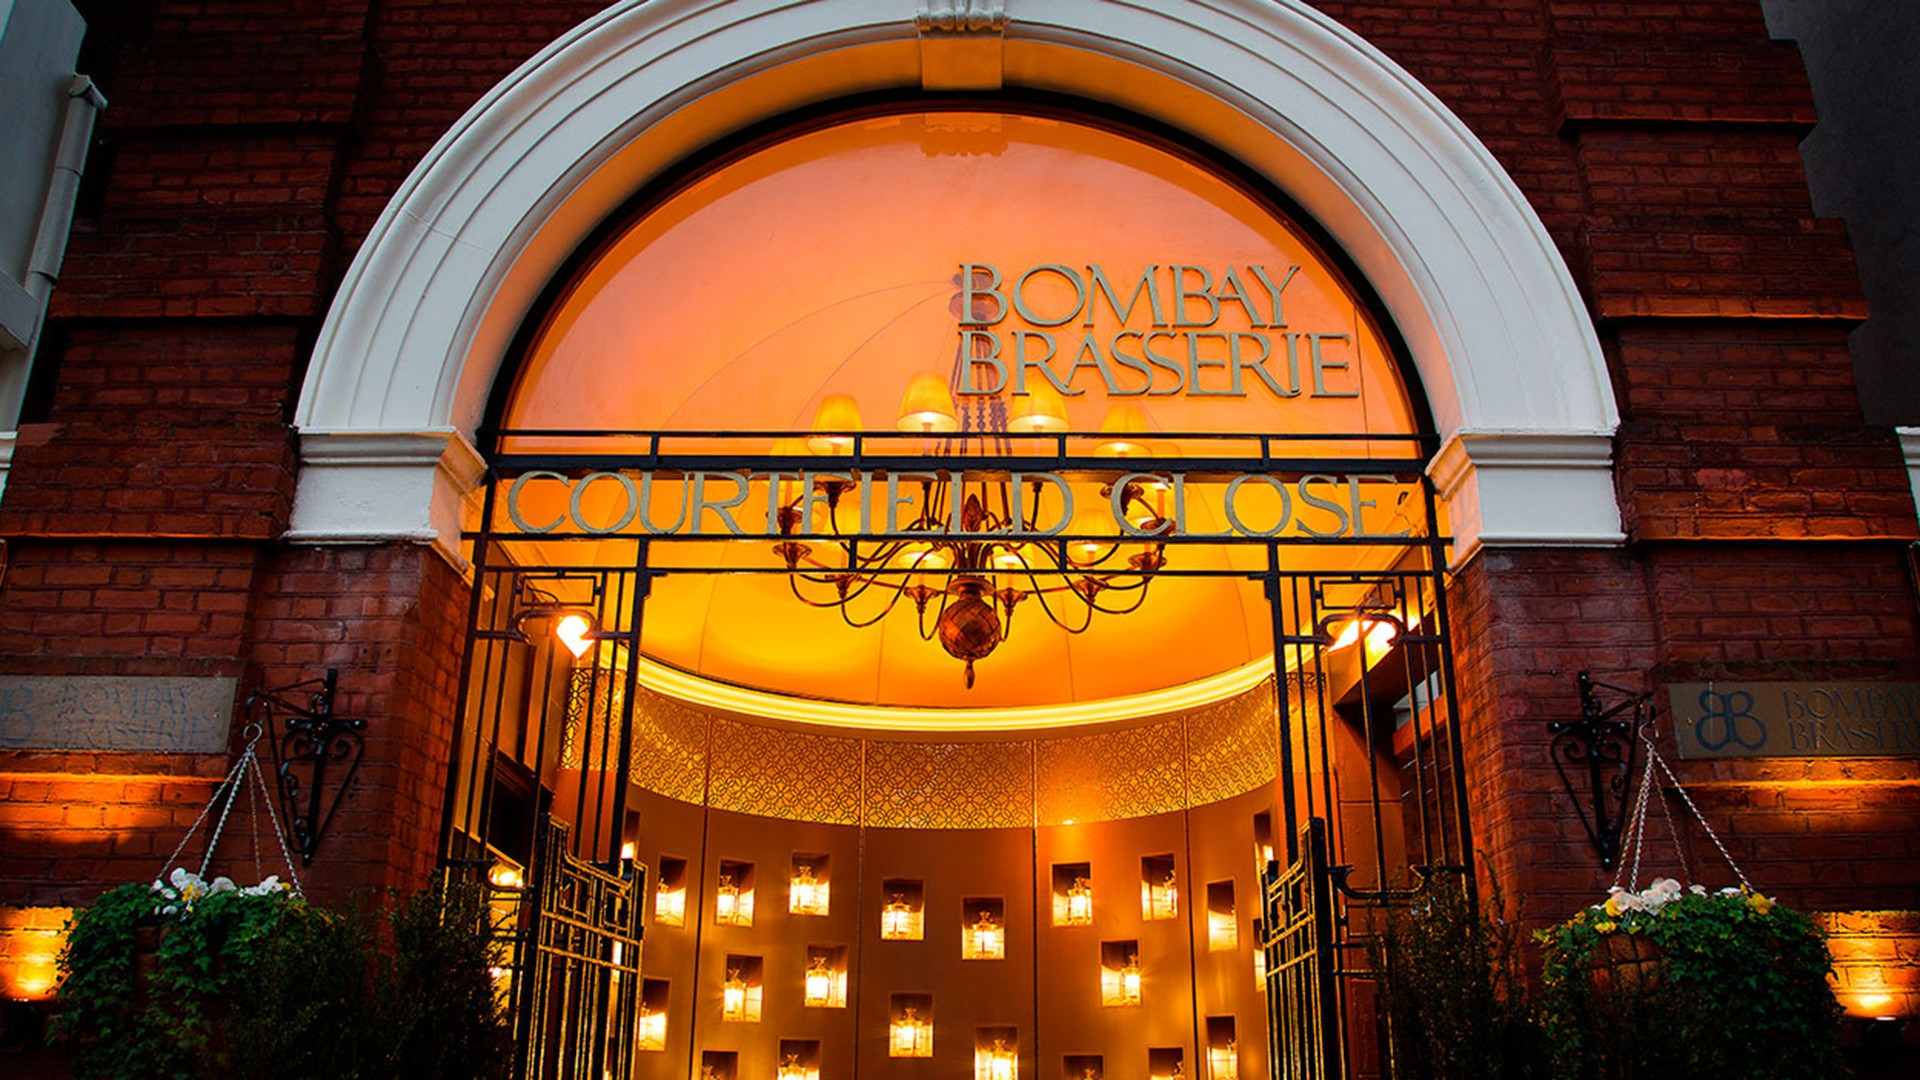 Bombay Brasserie exterior